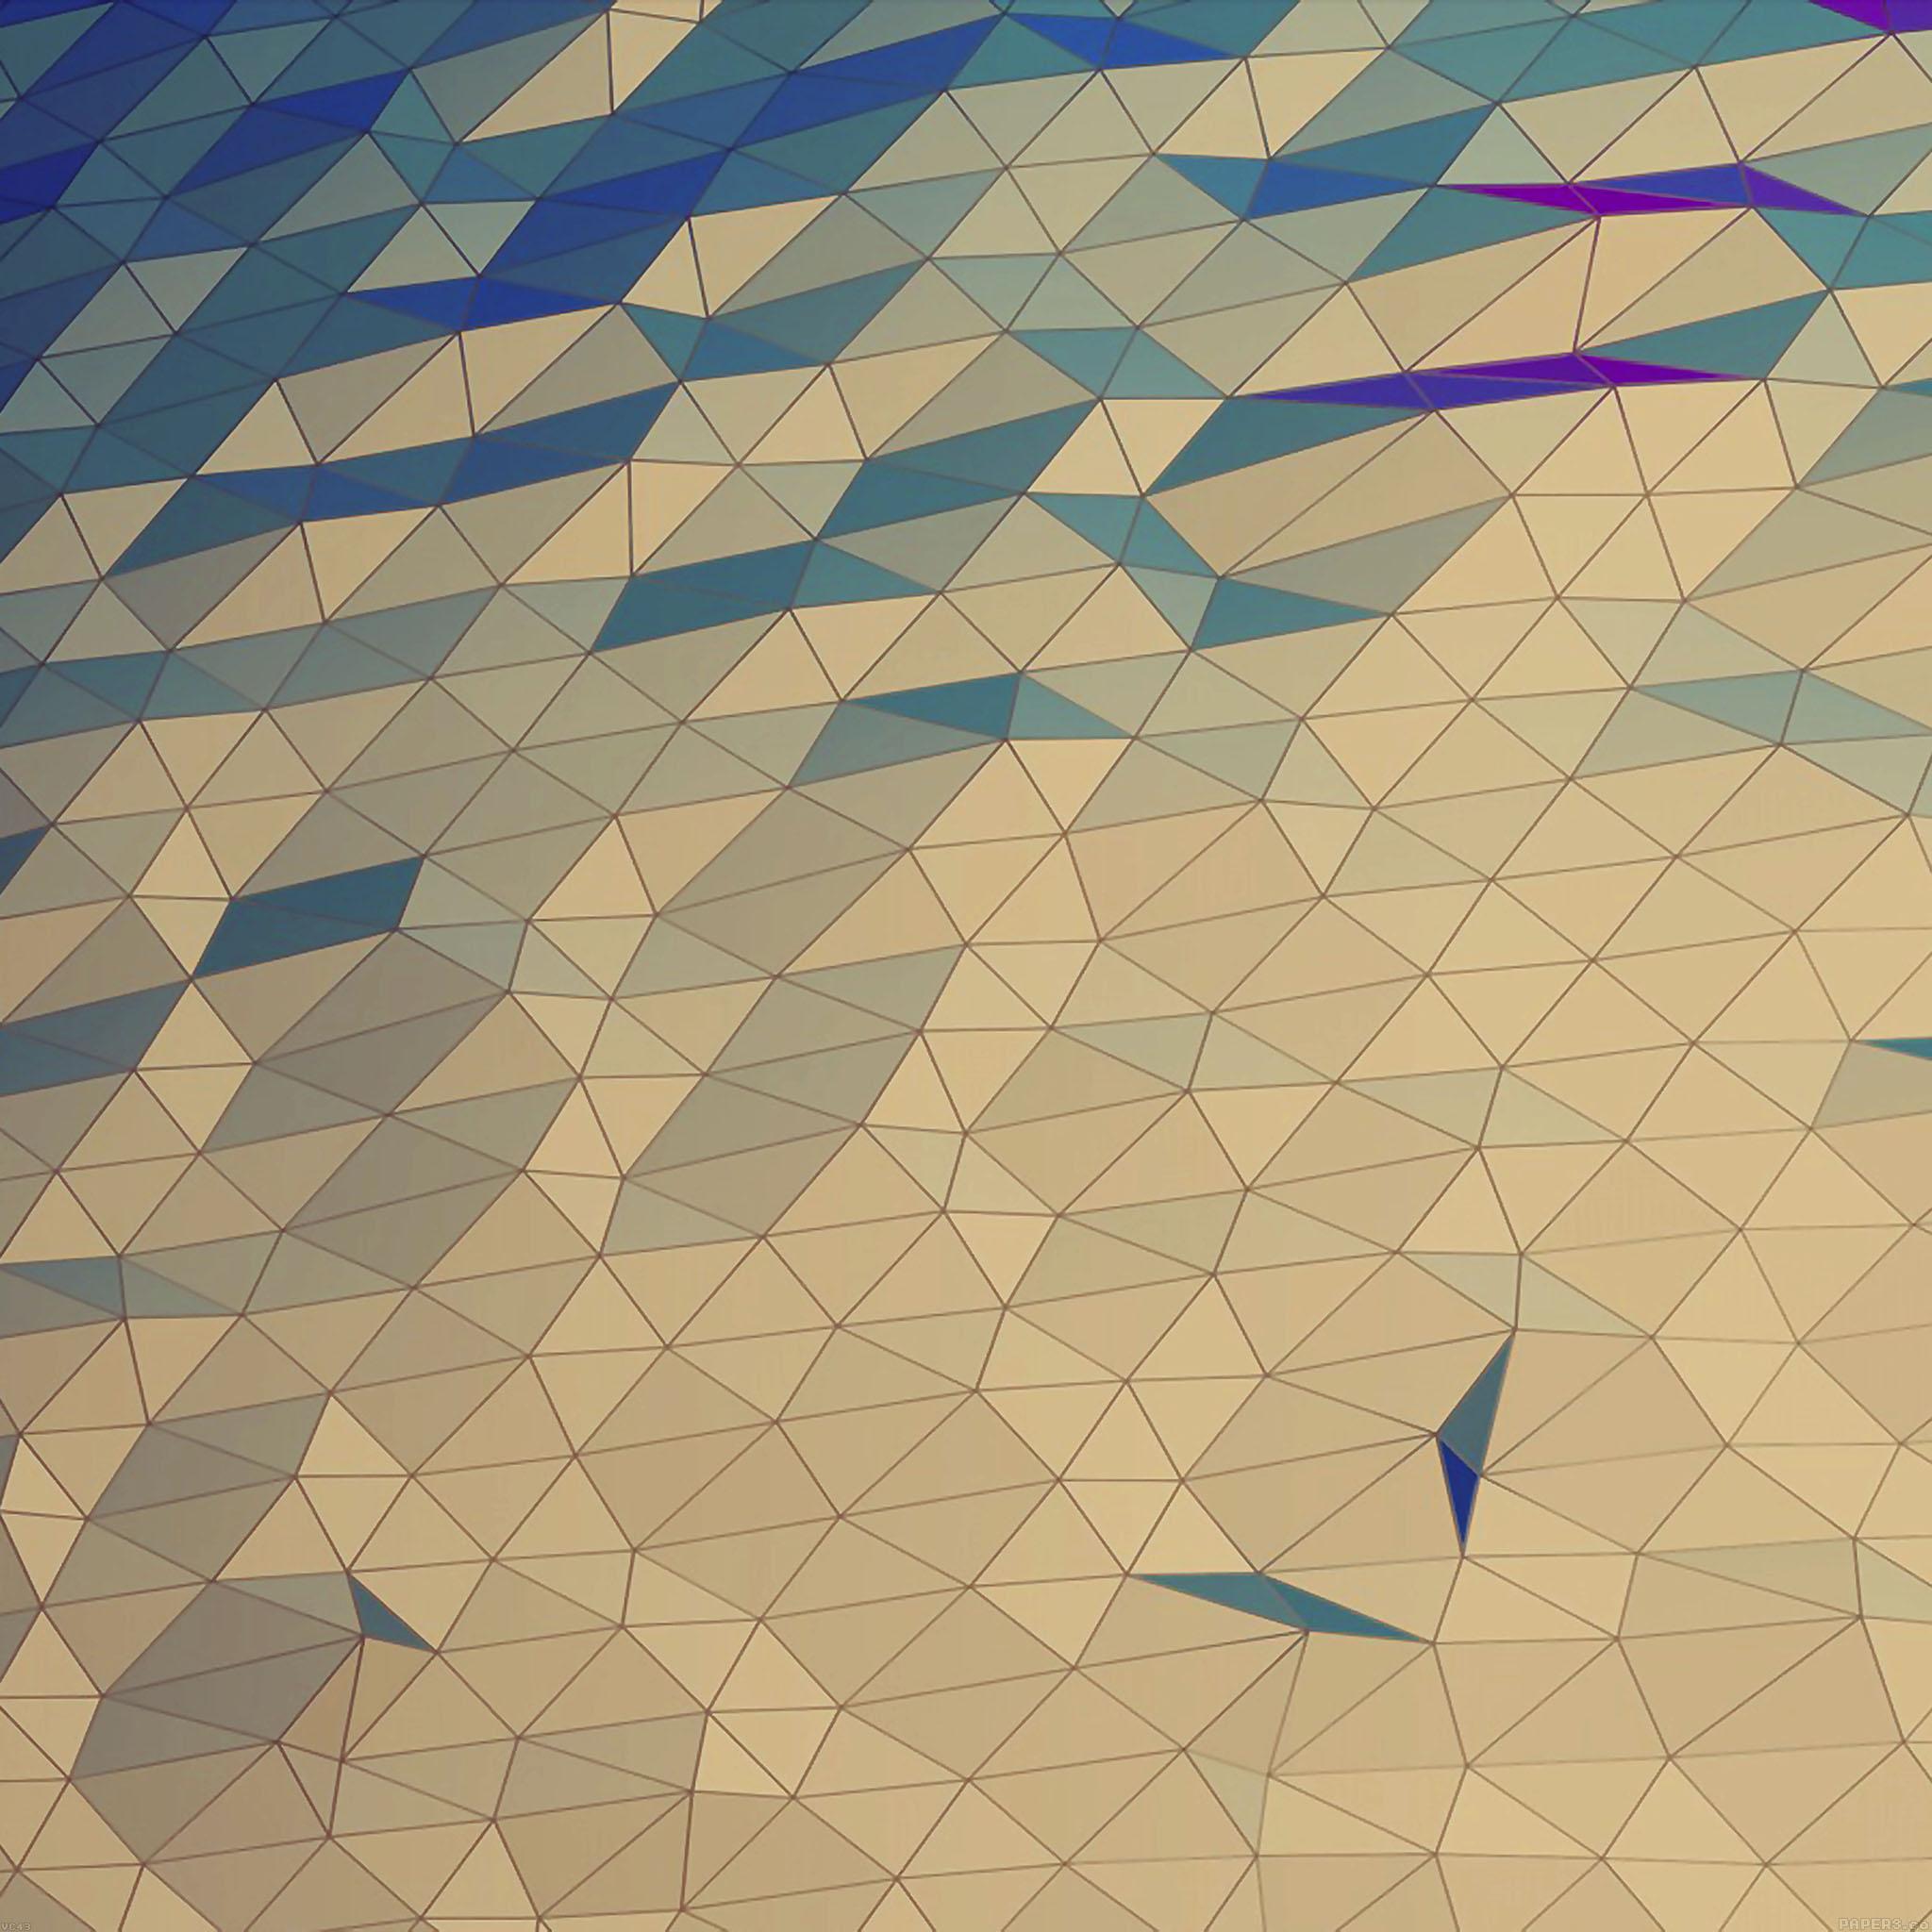 Line Art Wallpaper : Wallpapers